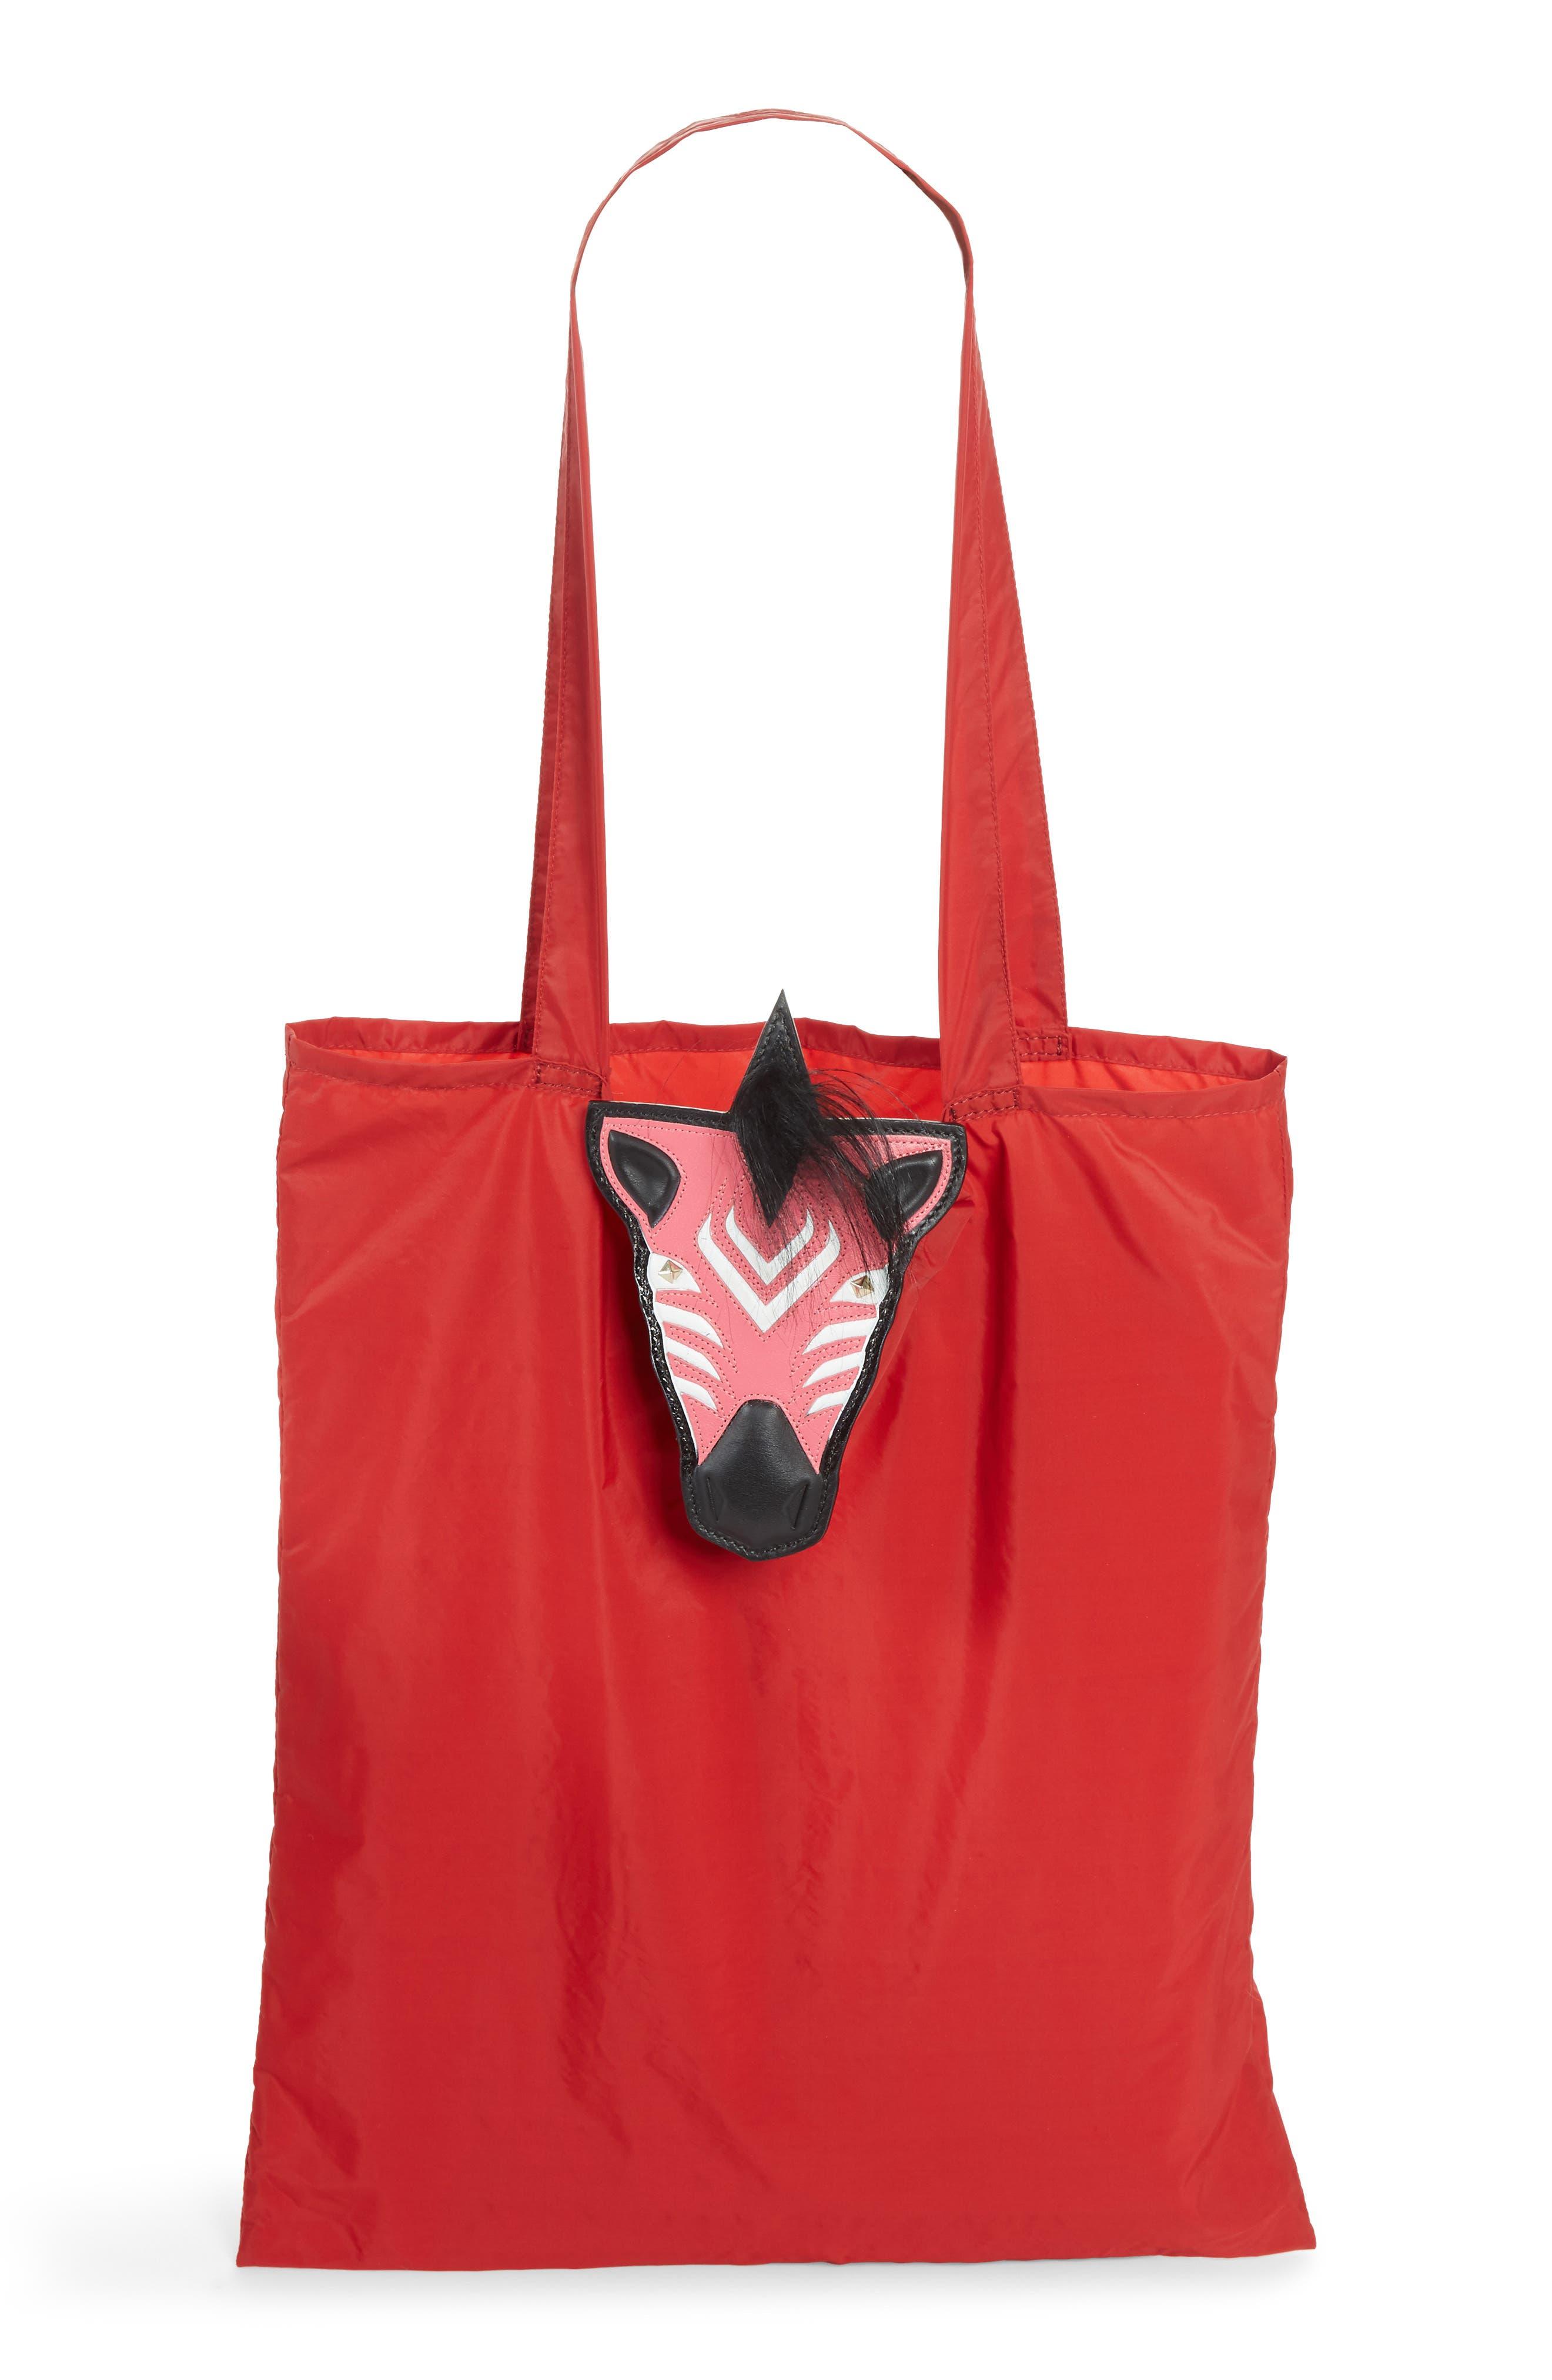 VALENTINO GARAVANI Nylon Tote with Genuine Goat Fur & Leather Bag Charm